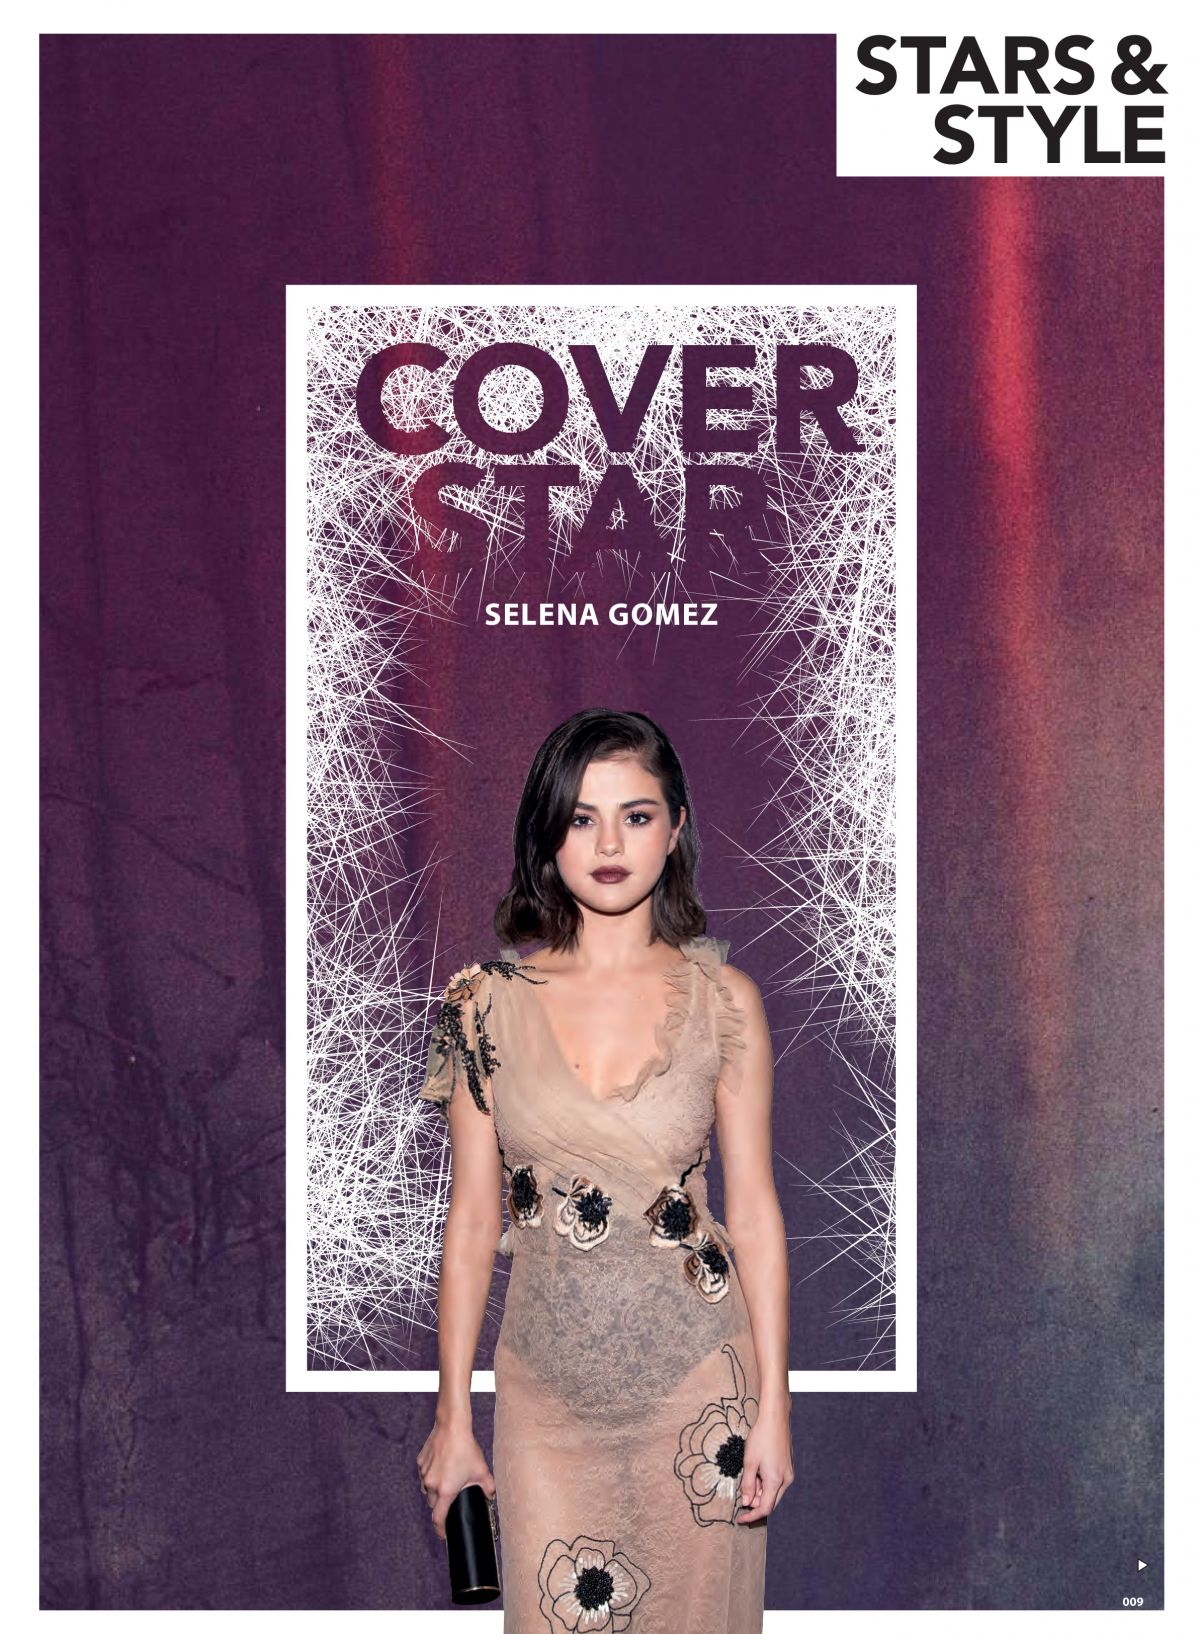 SELENA GOMEZ in Miss Magazine, Winter 2017/2018 - HawtCelebs